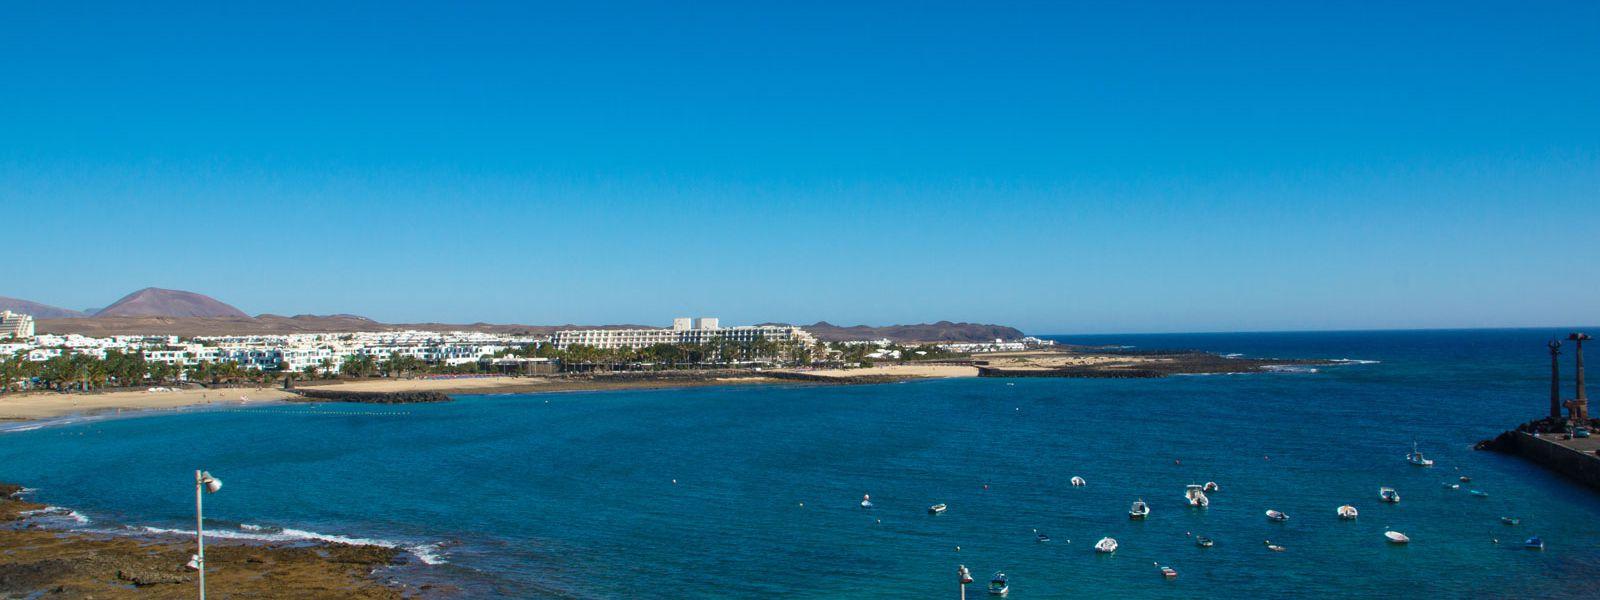 Appartements vue mer Costa Teguise